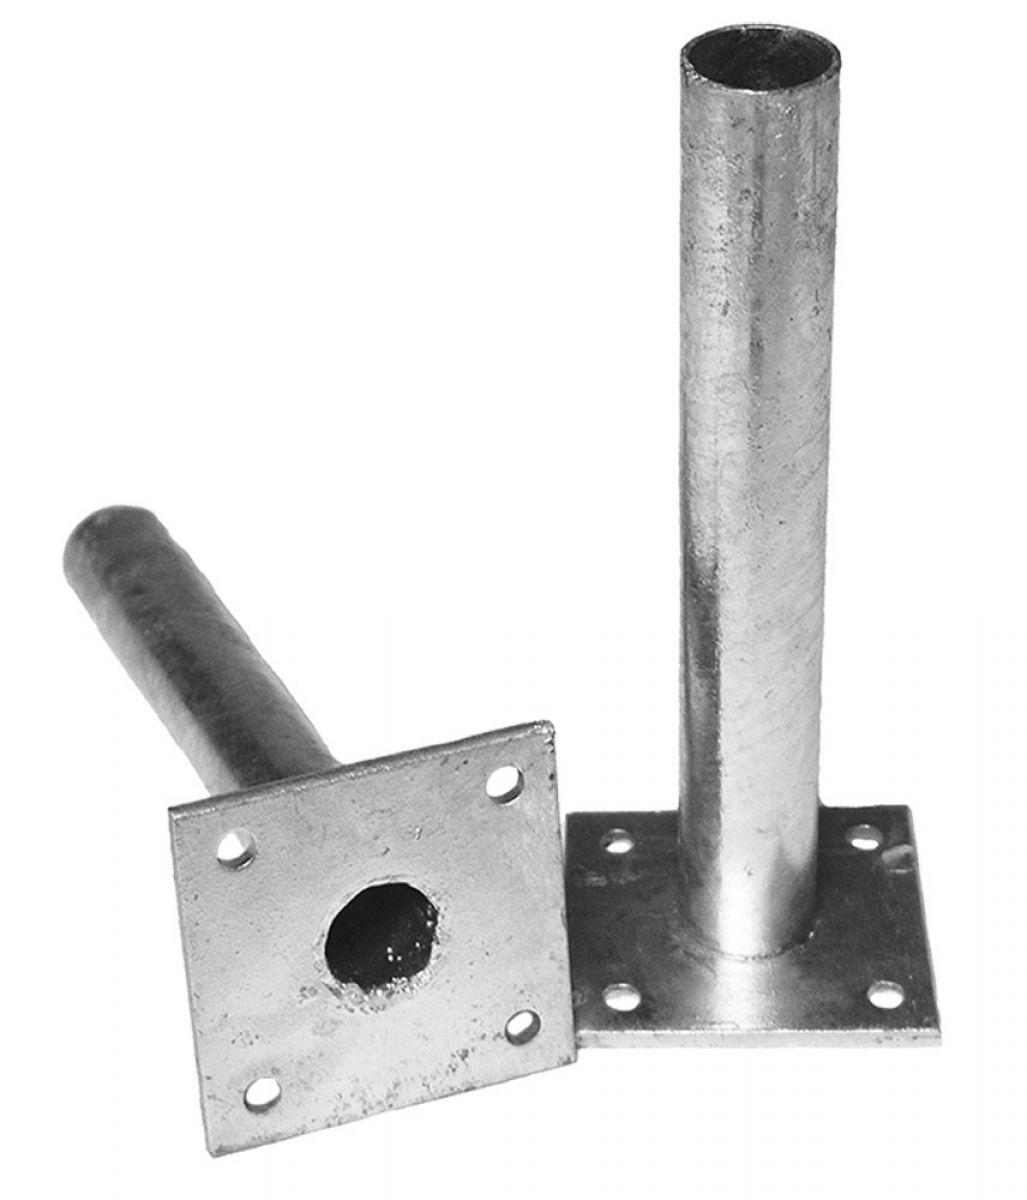 zaun-nagel - einschlagbodenhülse zum maschendrahtzaun